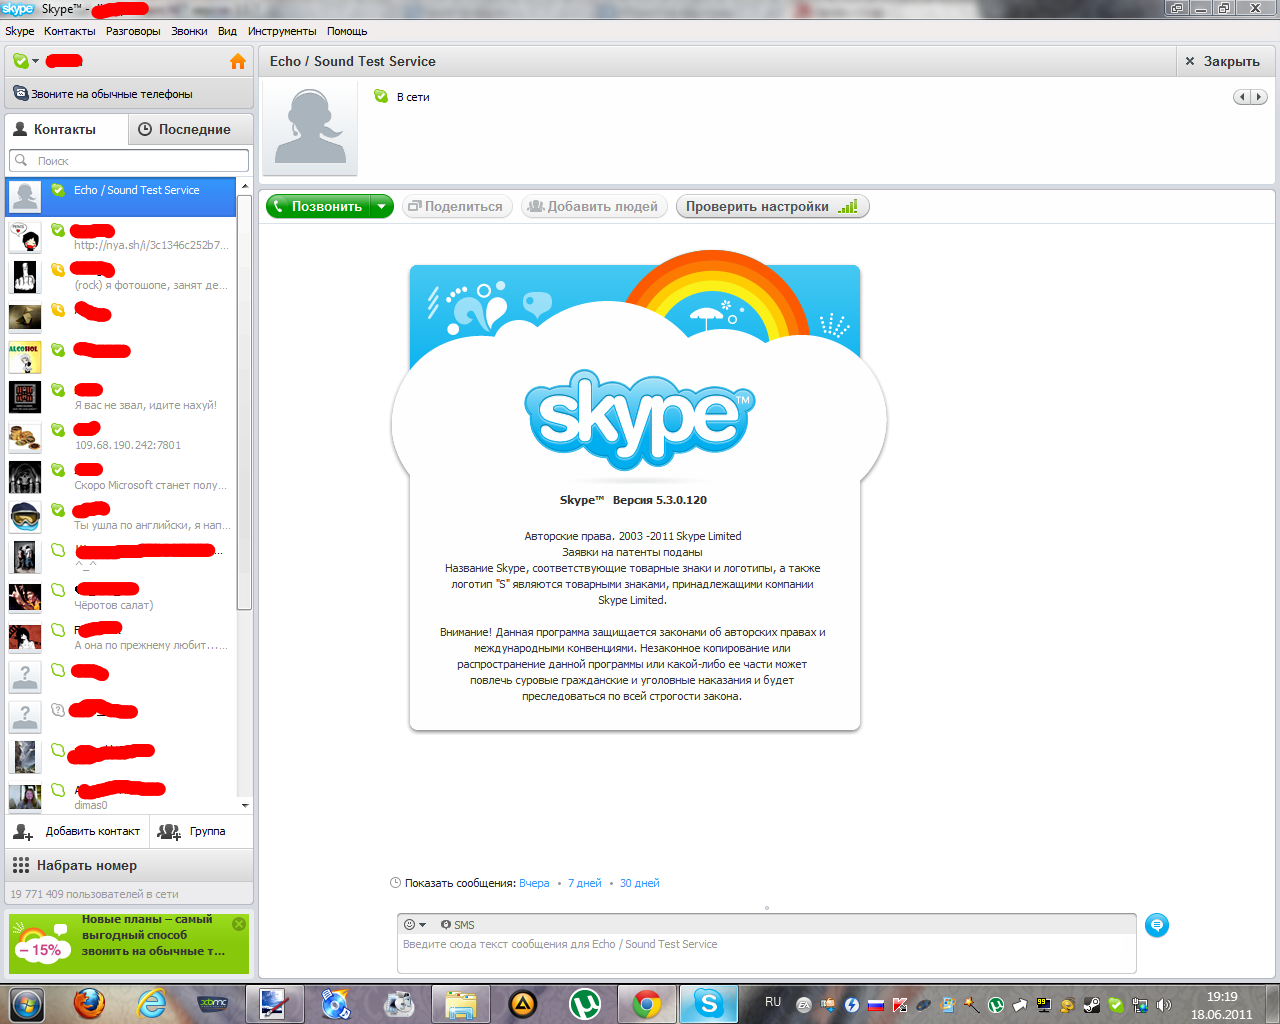 Скачать skype rus full setup